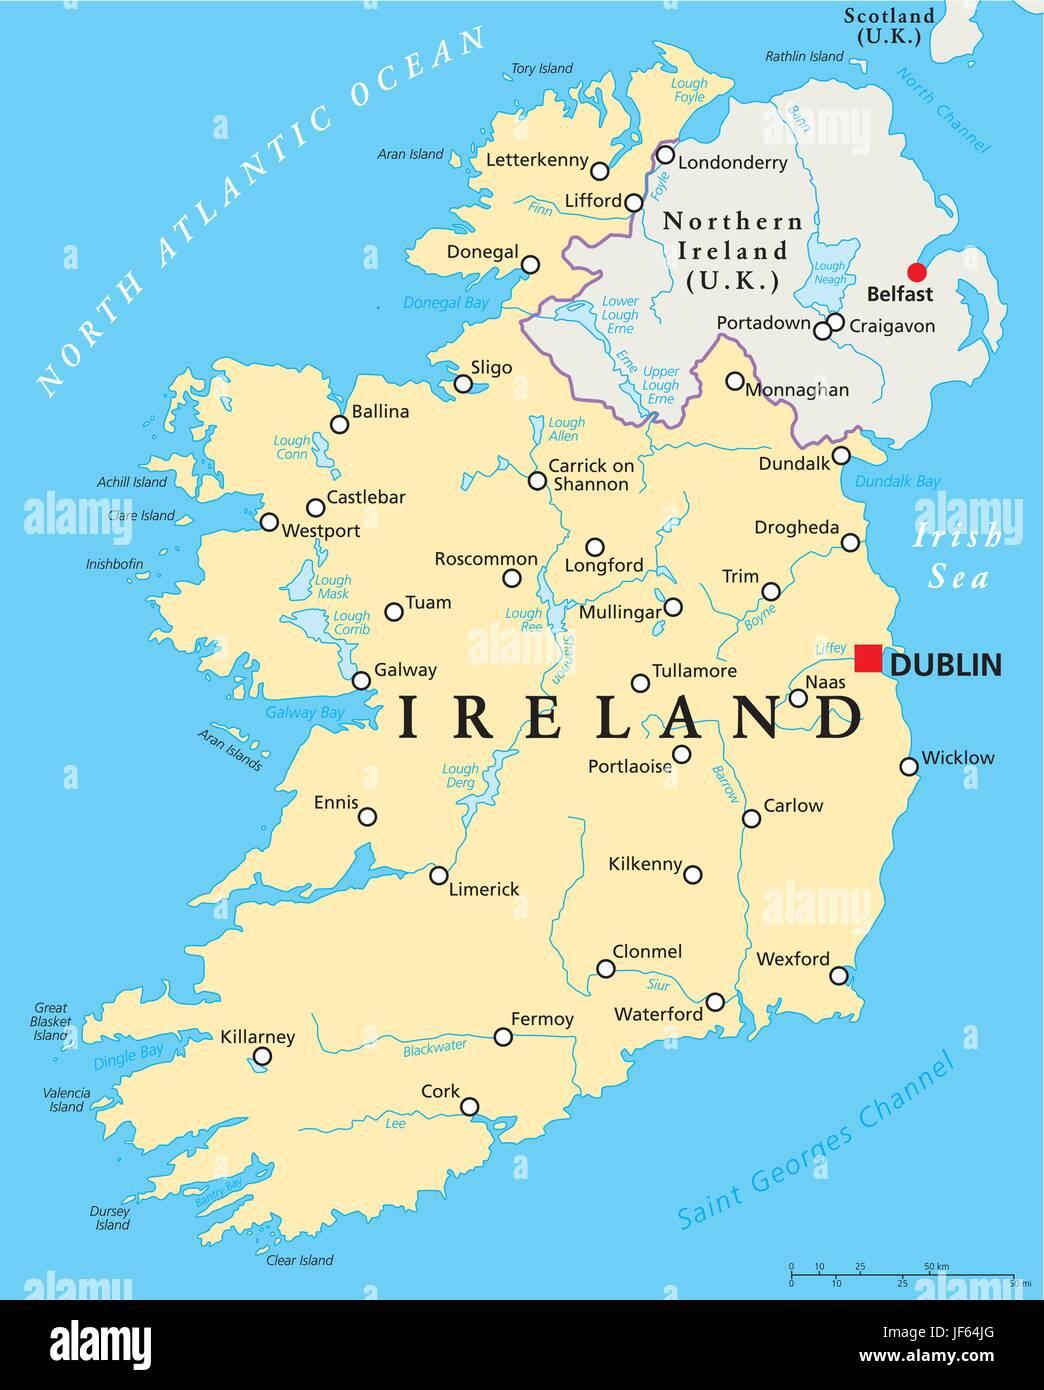 Ireland map atlas map of the world atlantic ocean salt water ireland map atlas map of the world atlantic ocean salt water sea ocean gumiabroncs Choice Image